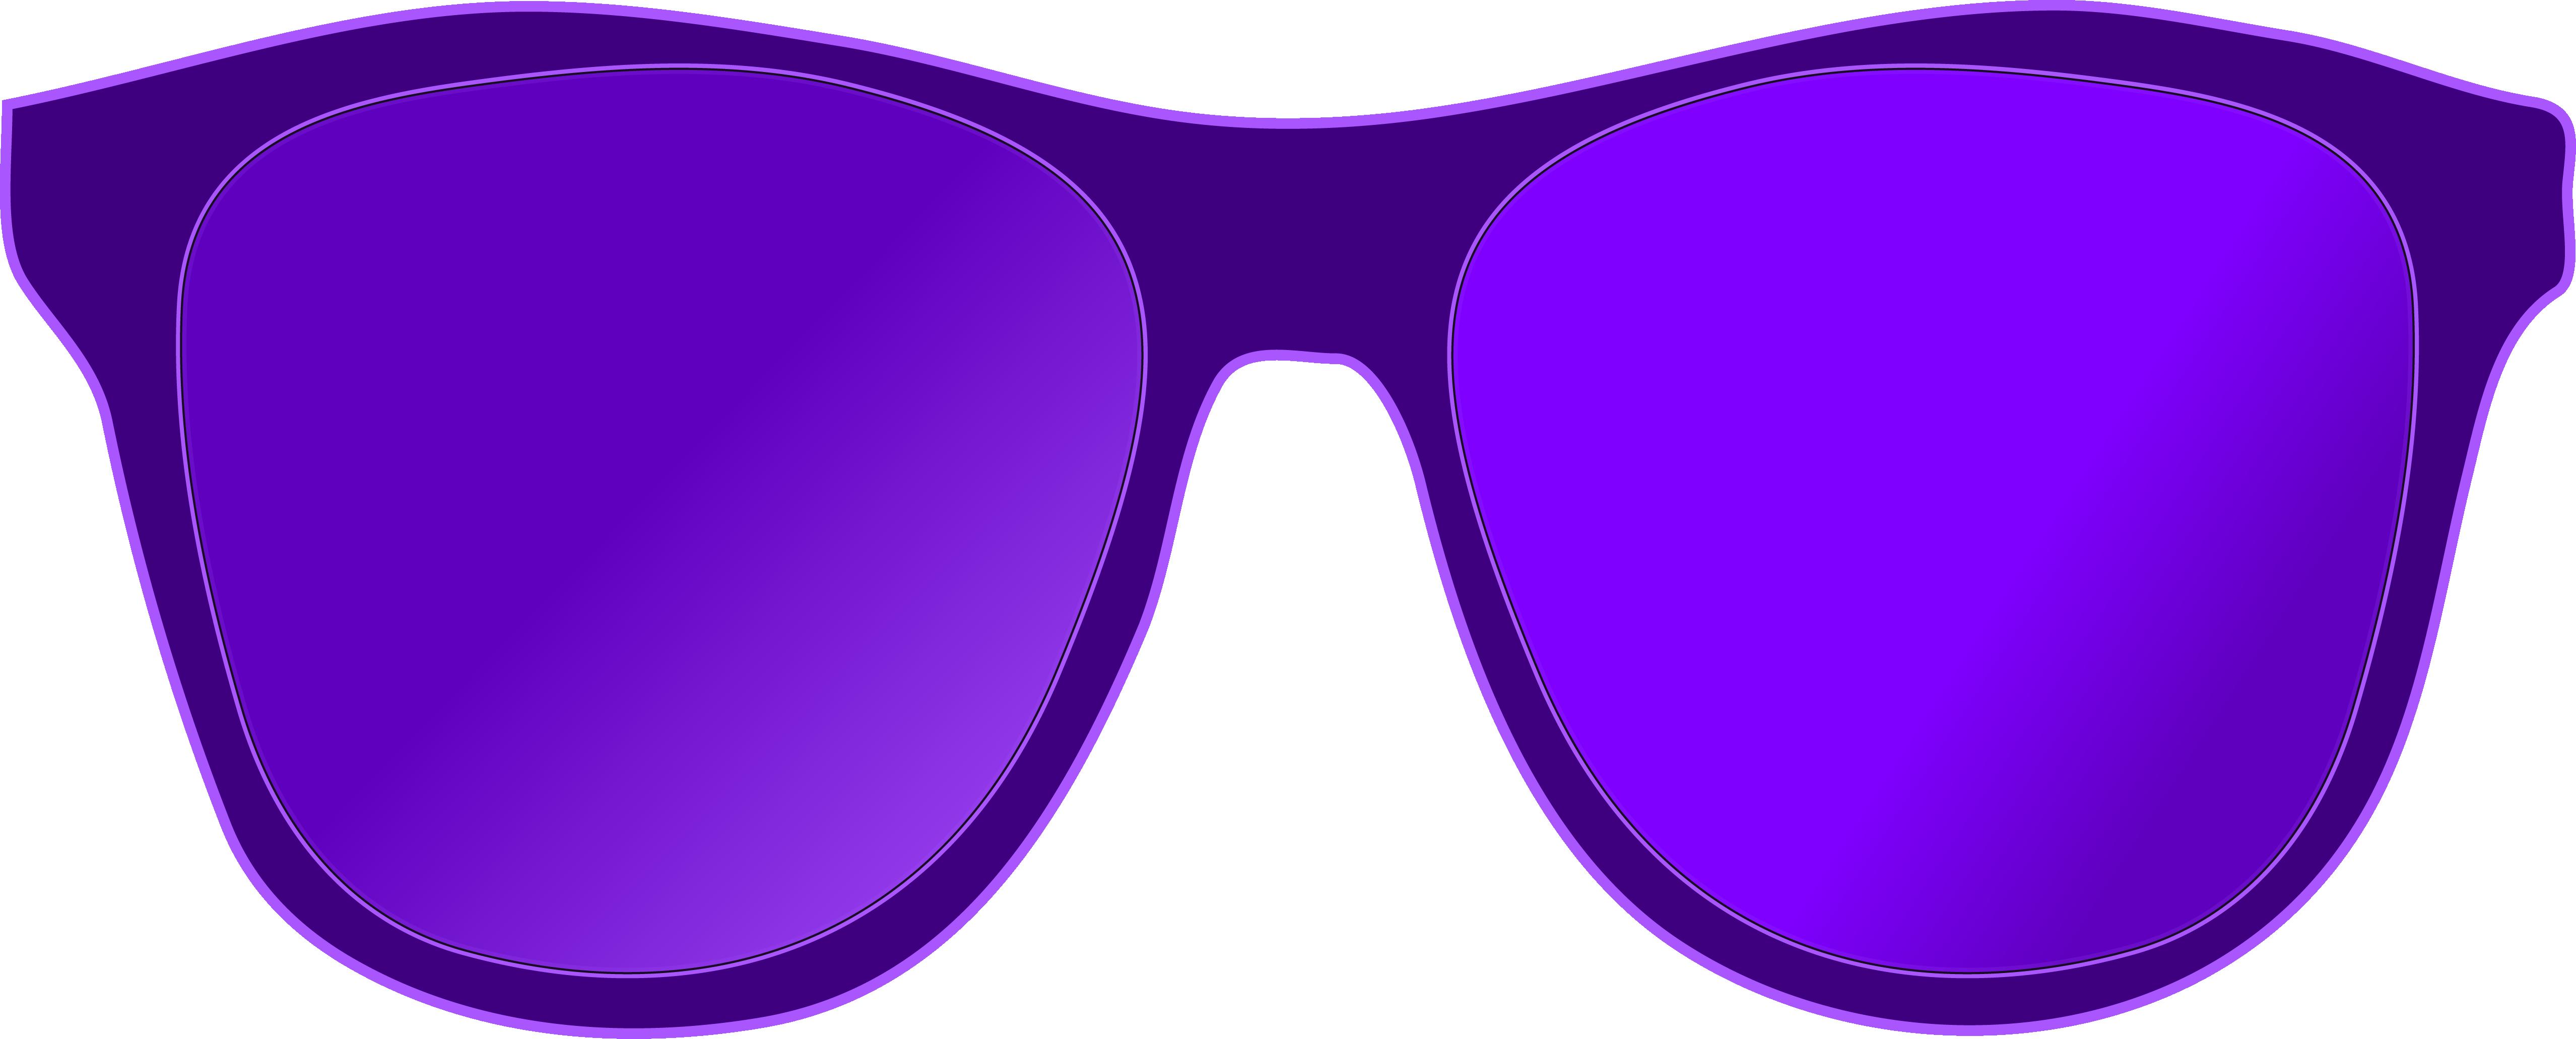 Sunglasses free pink clip. Glass clipart sunglass